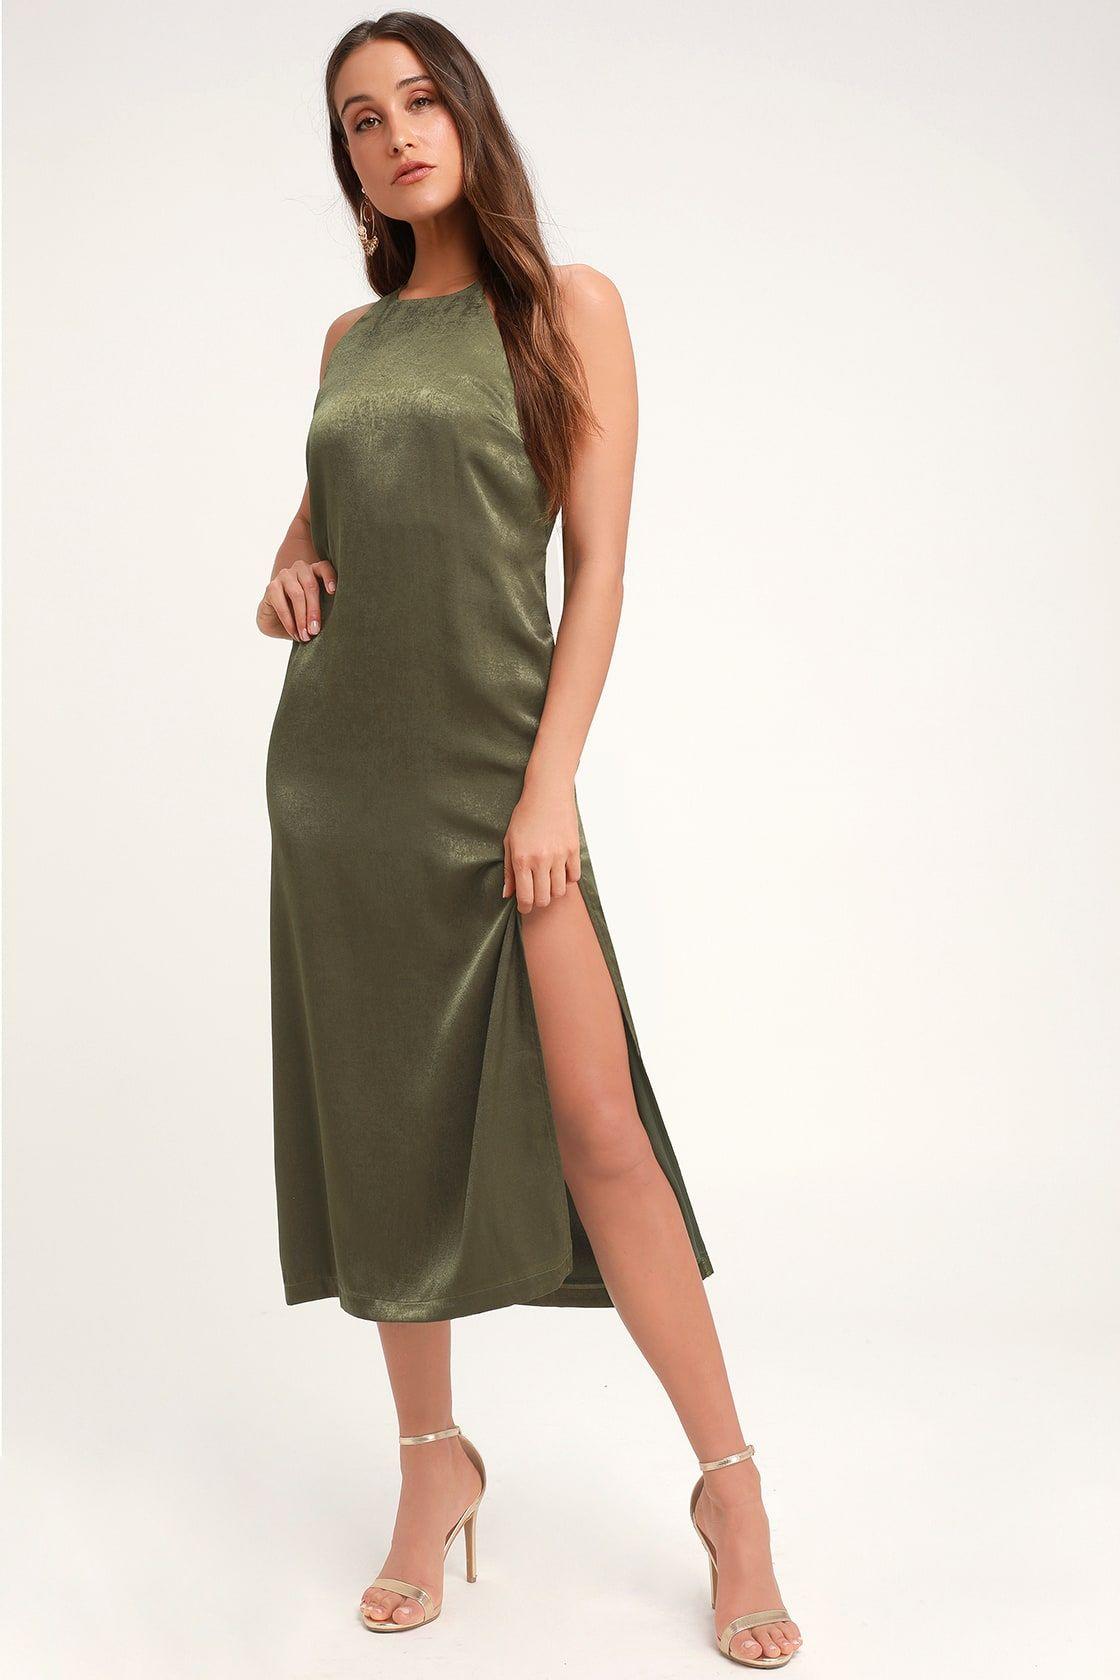 0b179a3200b5e0 Lulus | Savona Olive Green Satin Midi Dress | Size Large | 100 ...